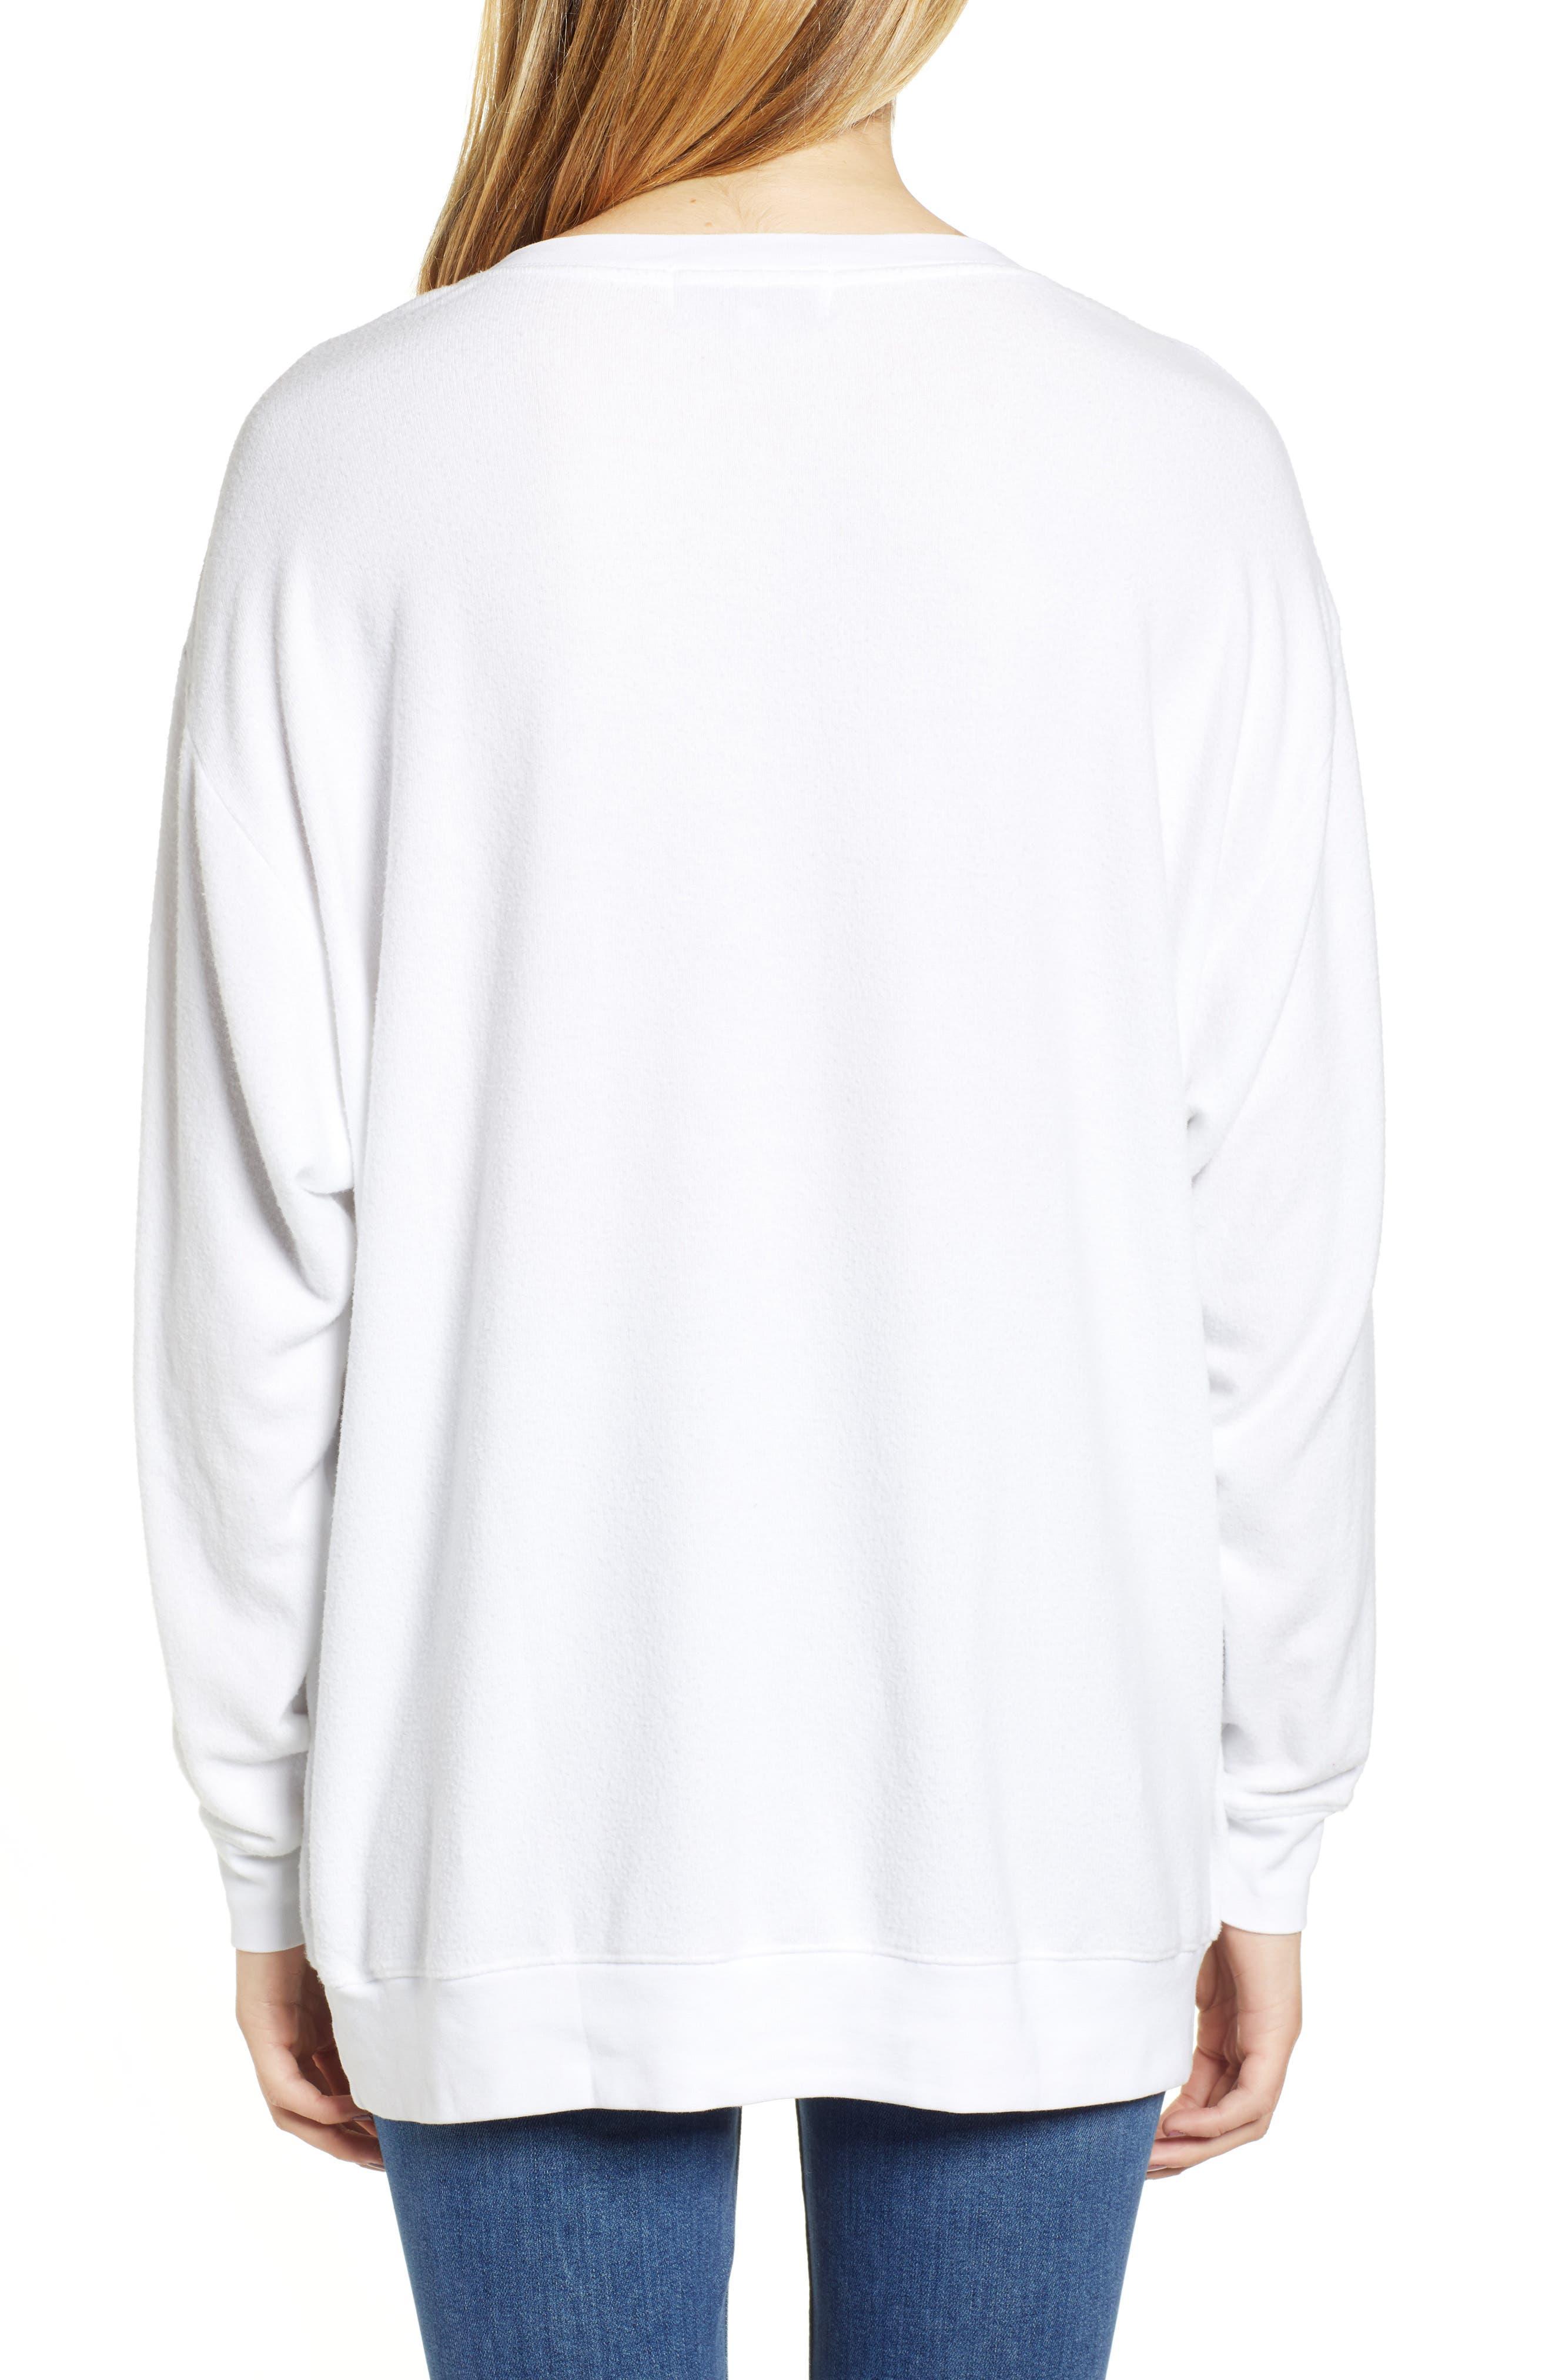 Roadtrip - Racer Check Sweatshirt,                             Alternate thumbnail 2, color,                             CLEAN WHITE